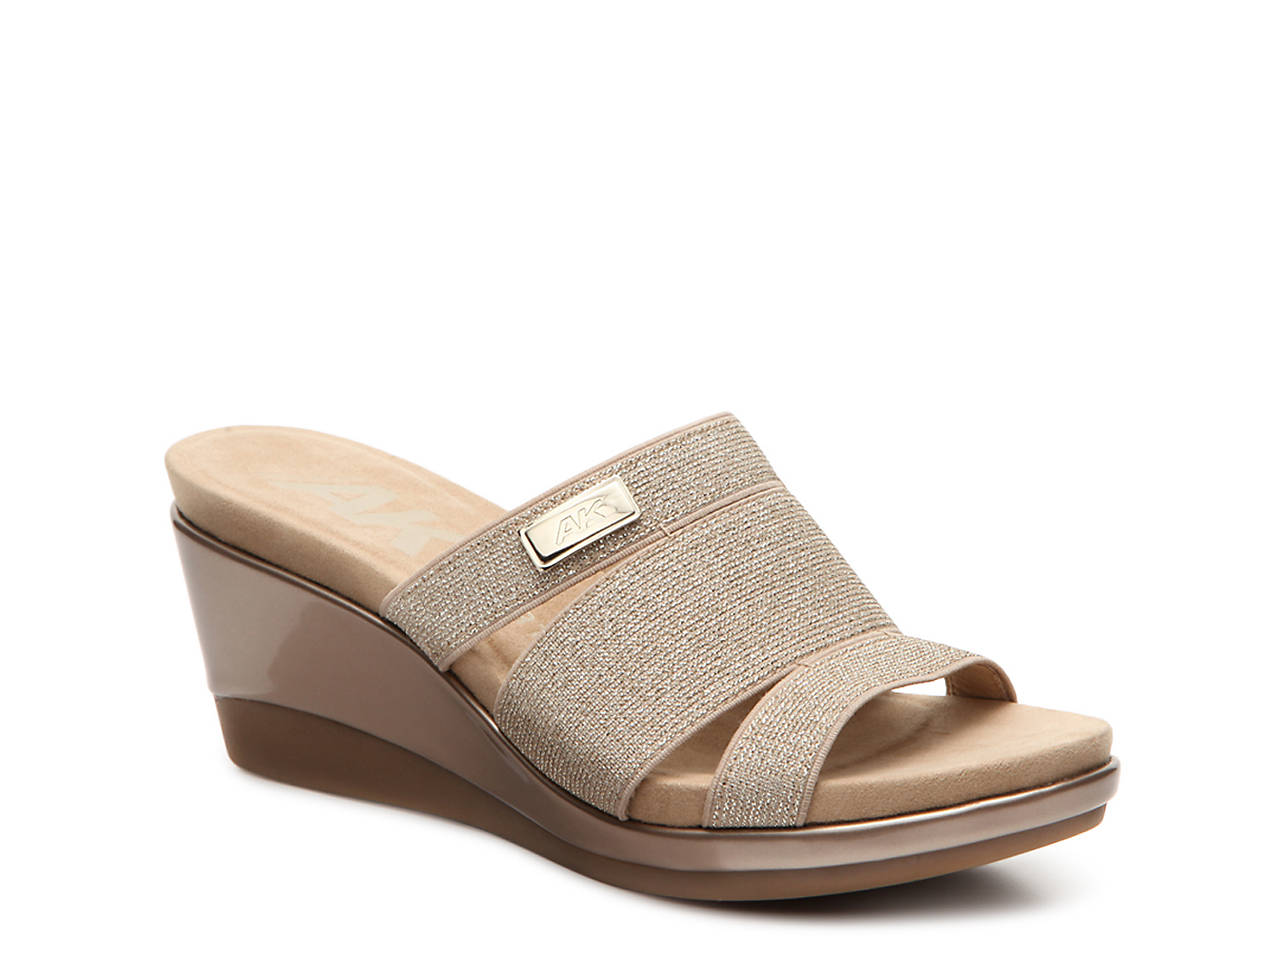 18b8eb5f282a6 Anne Klein Sport Penella Wedge Sandal Women's Shoes | DSW